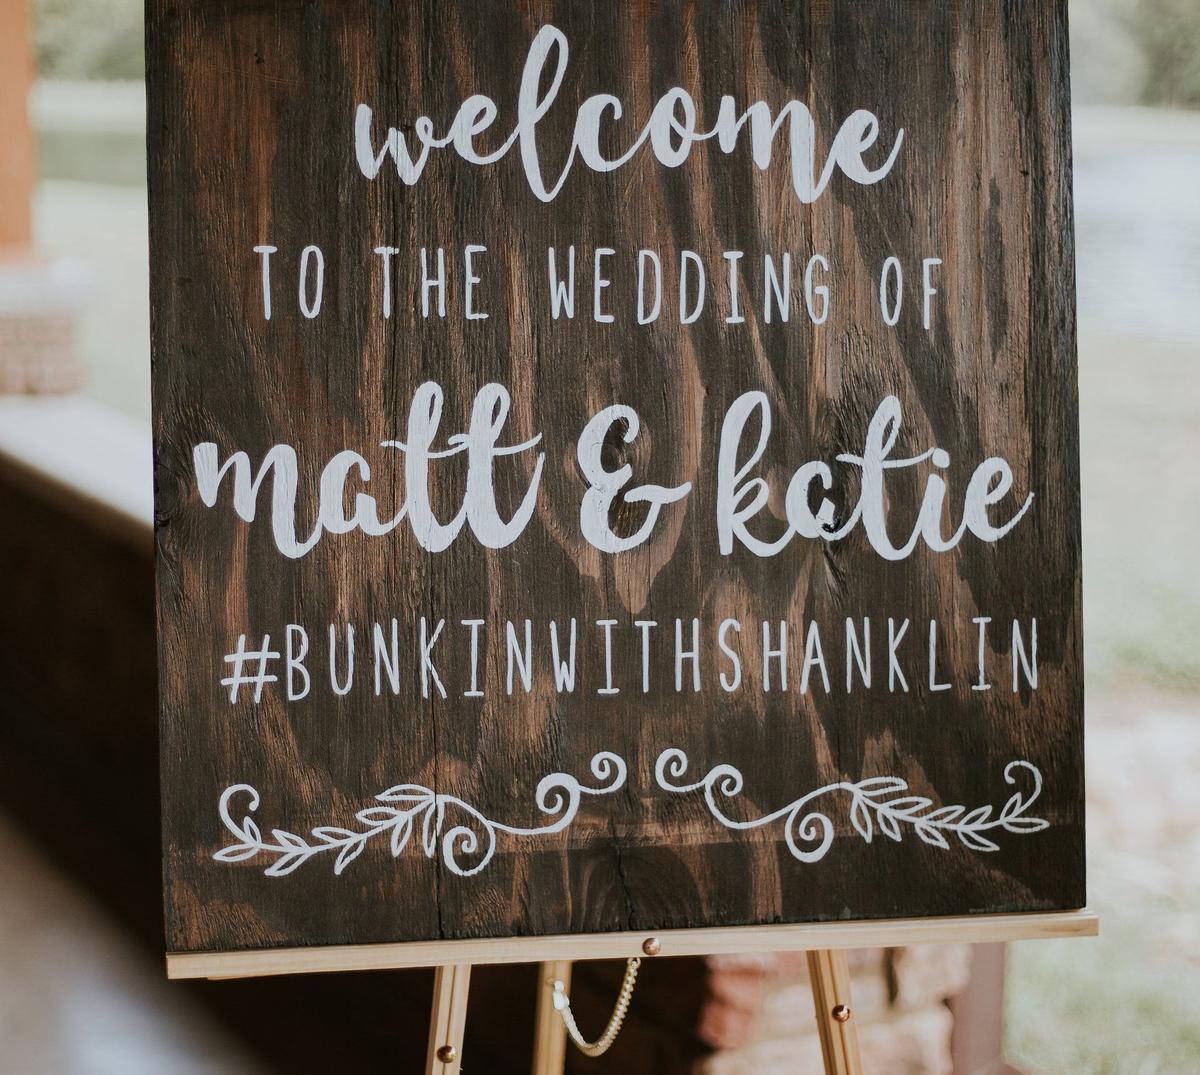 Sign of wedding listing the couple's wedding hashtag